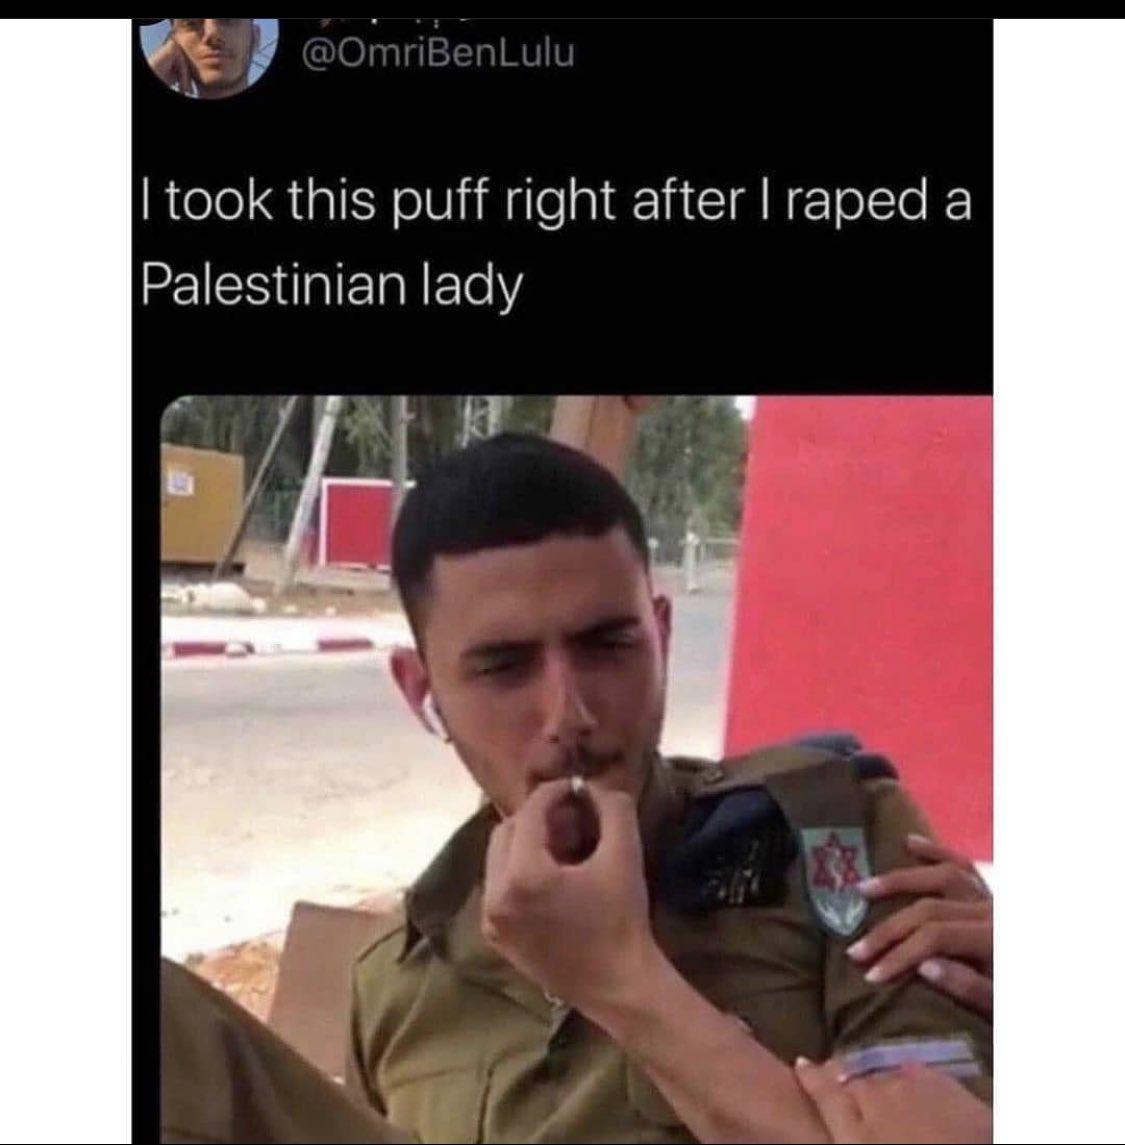 Hahahaha, burn in hell https://t.co/bMwNEsDug1